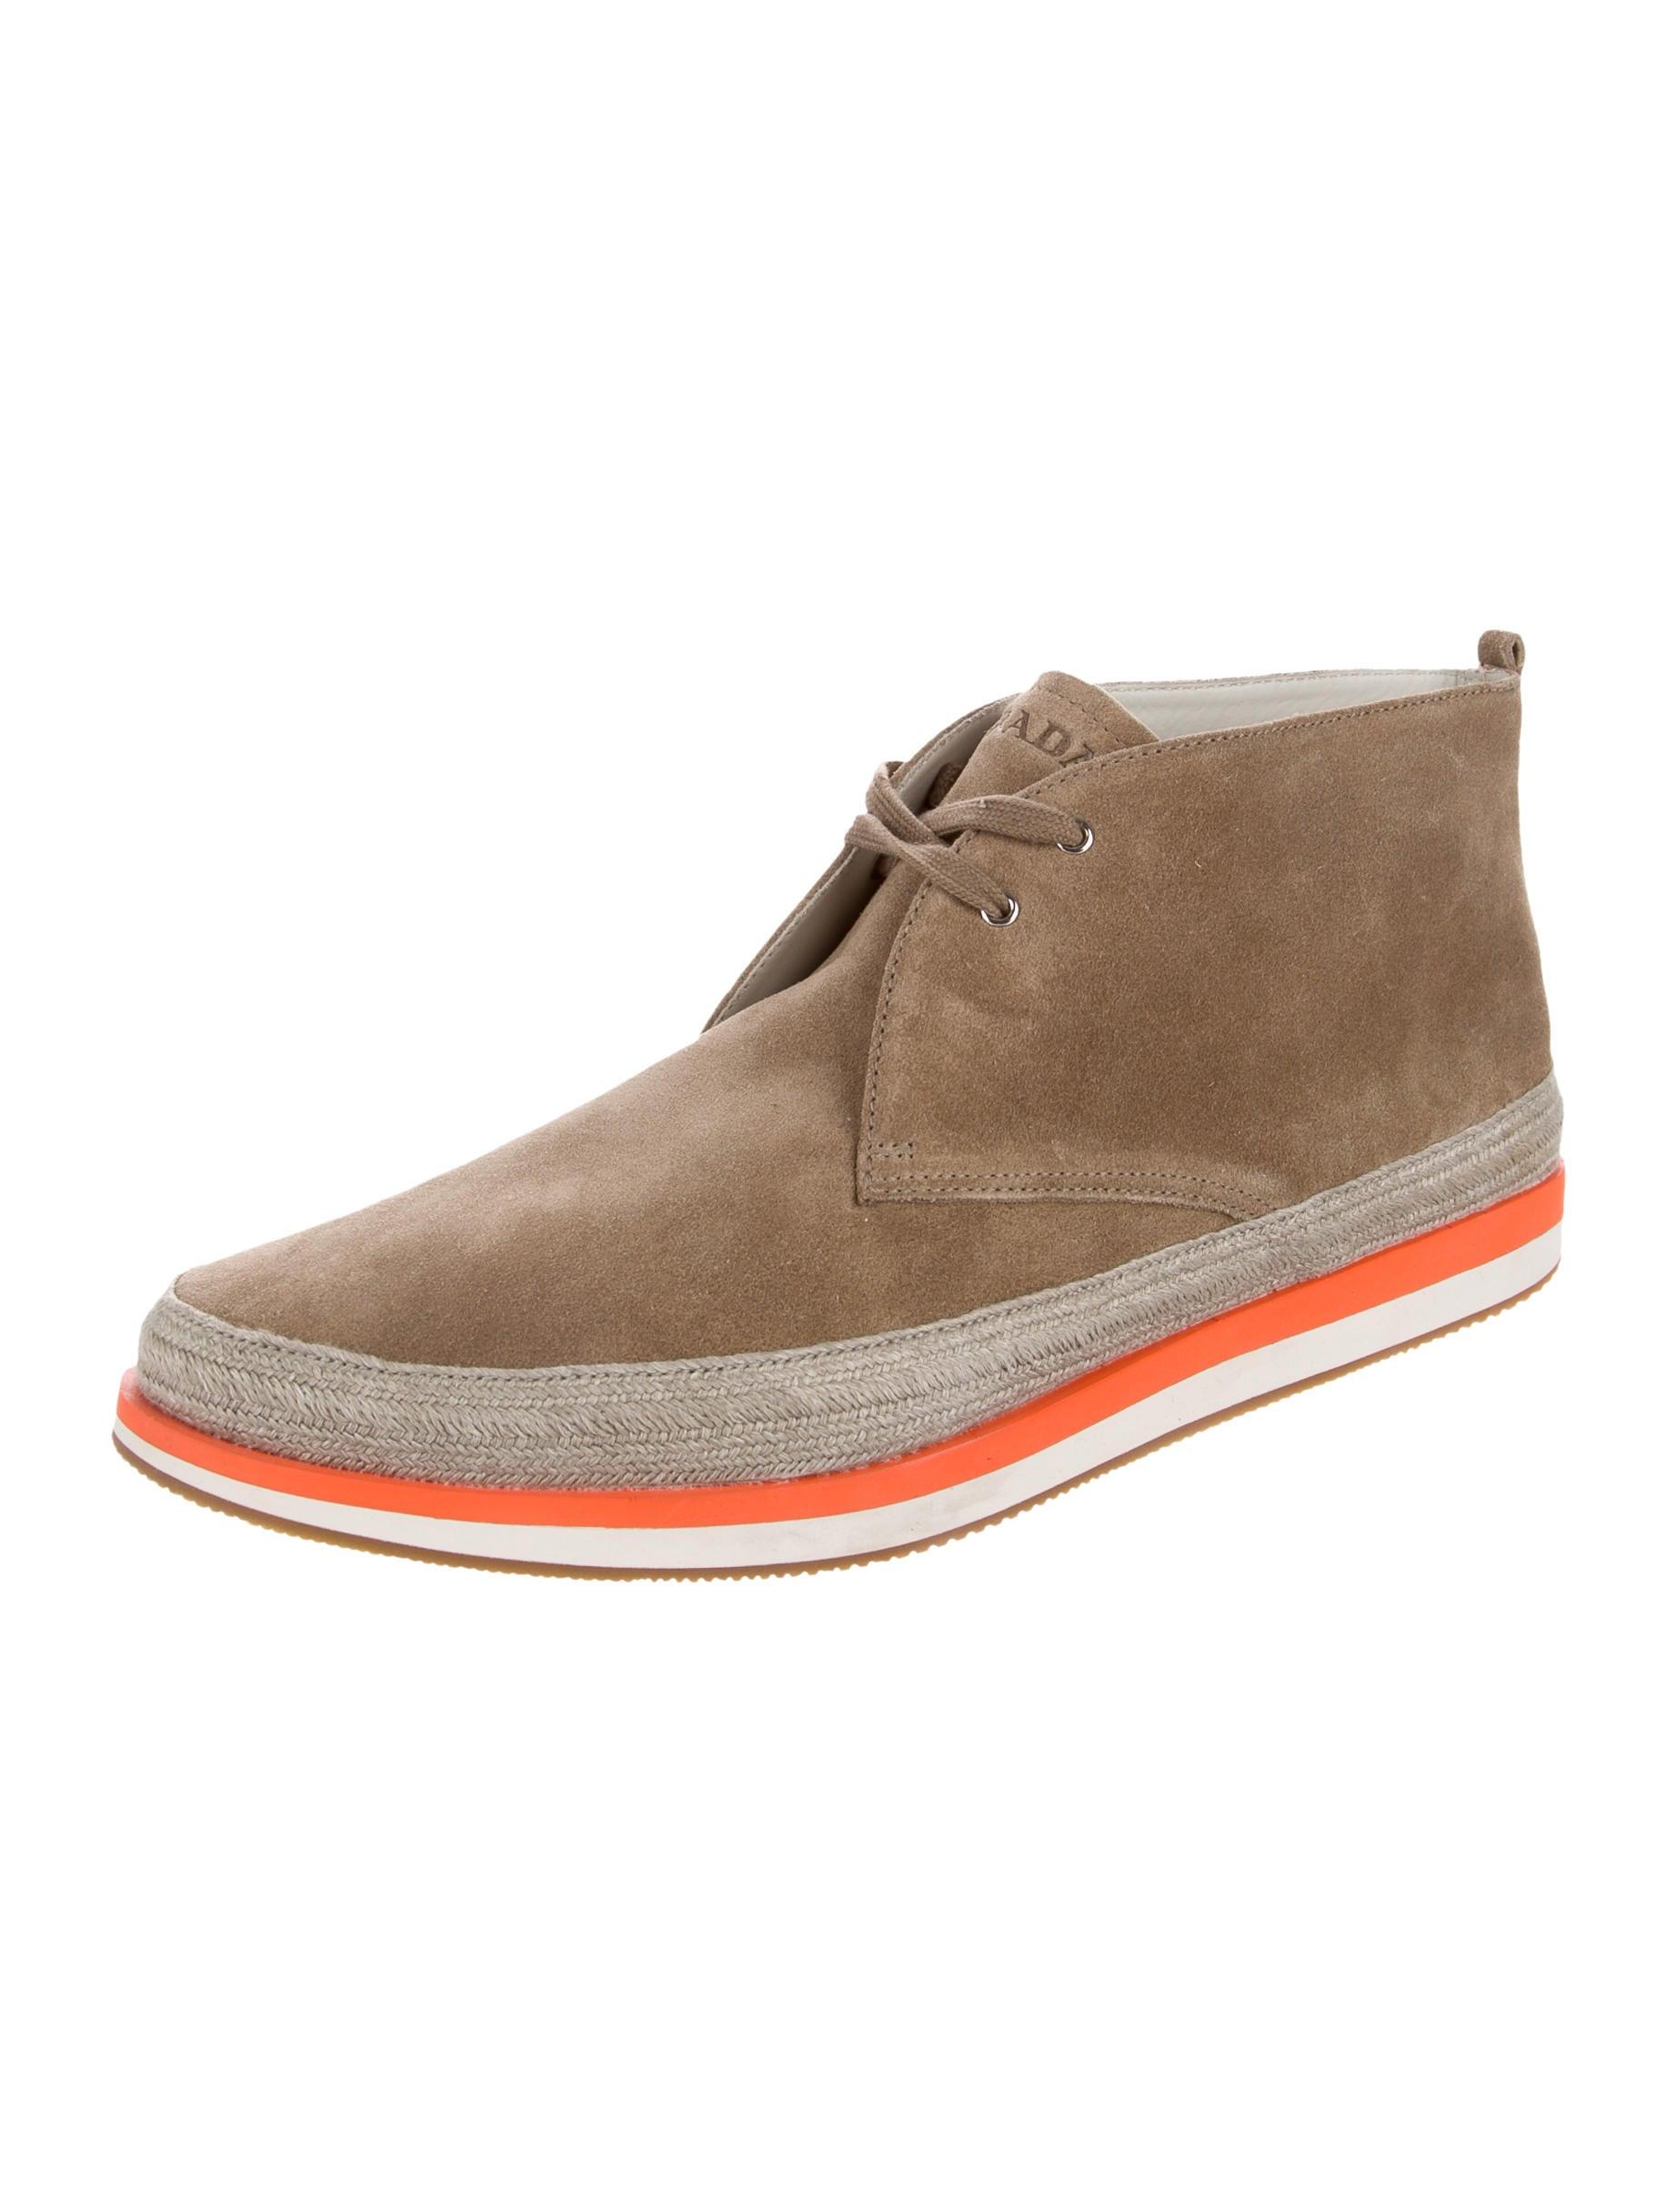 prada sport suede chukka boots shoes wpr44942 the